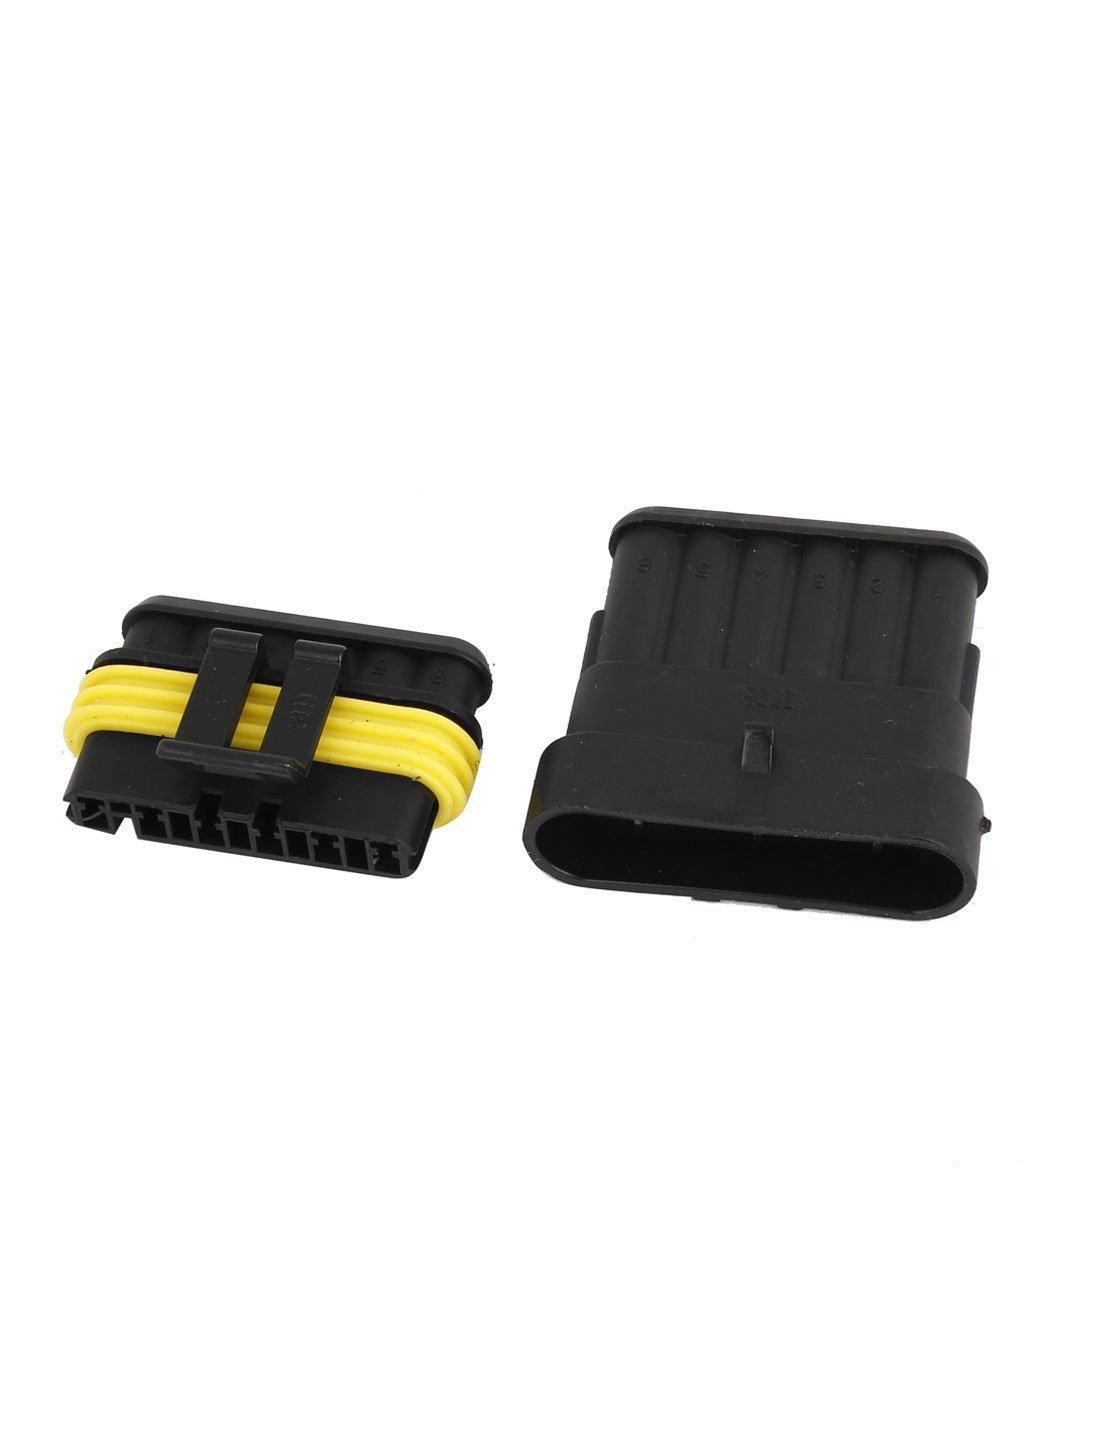 Amazon.com: eDealMax impermeable RV 6 Pin 6 vías Conector coche del Barco del carro ATV UTV: Electronics